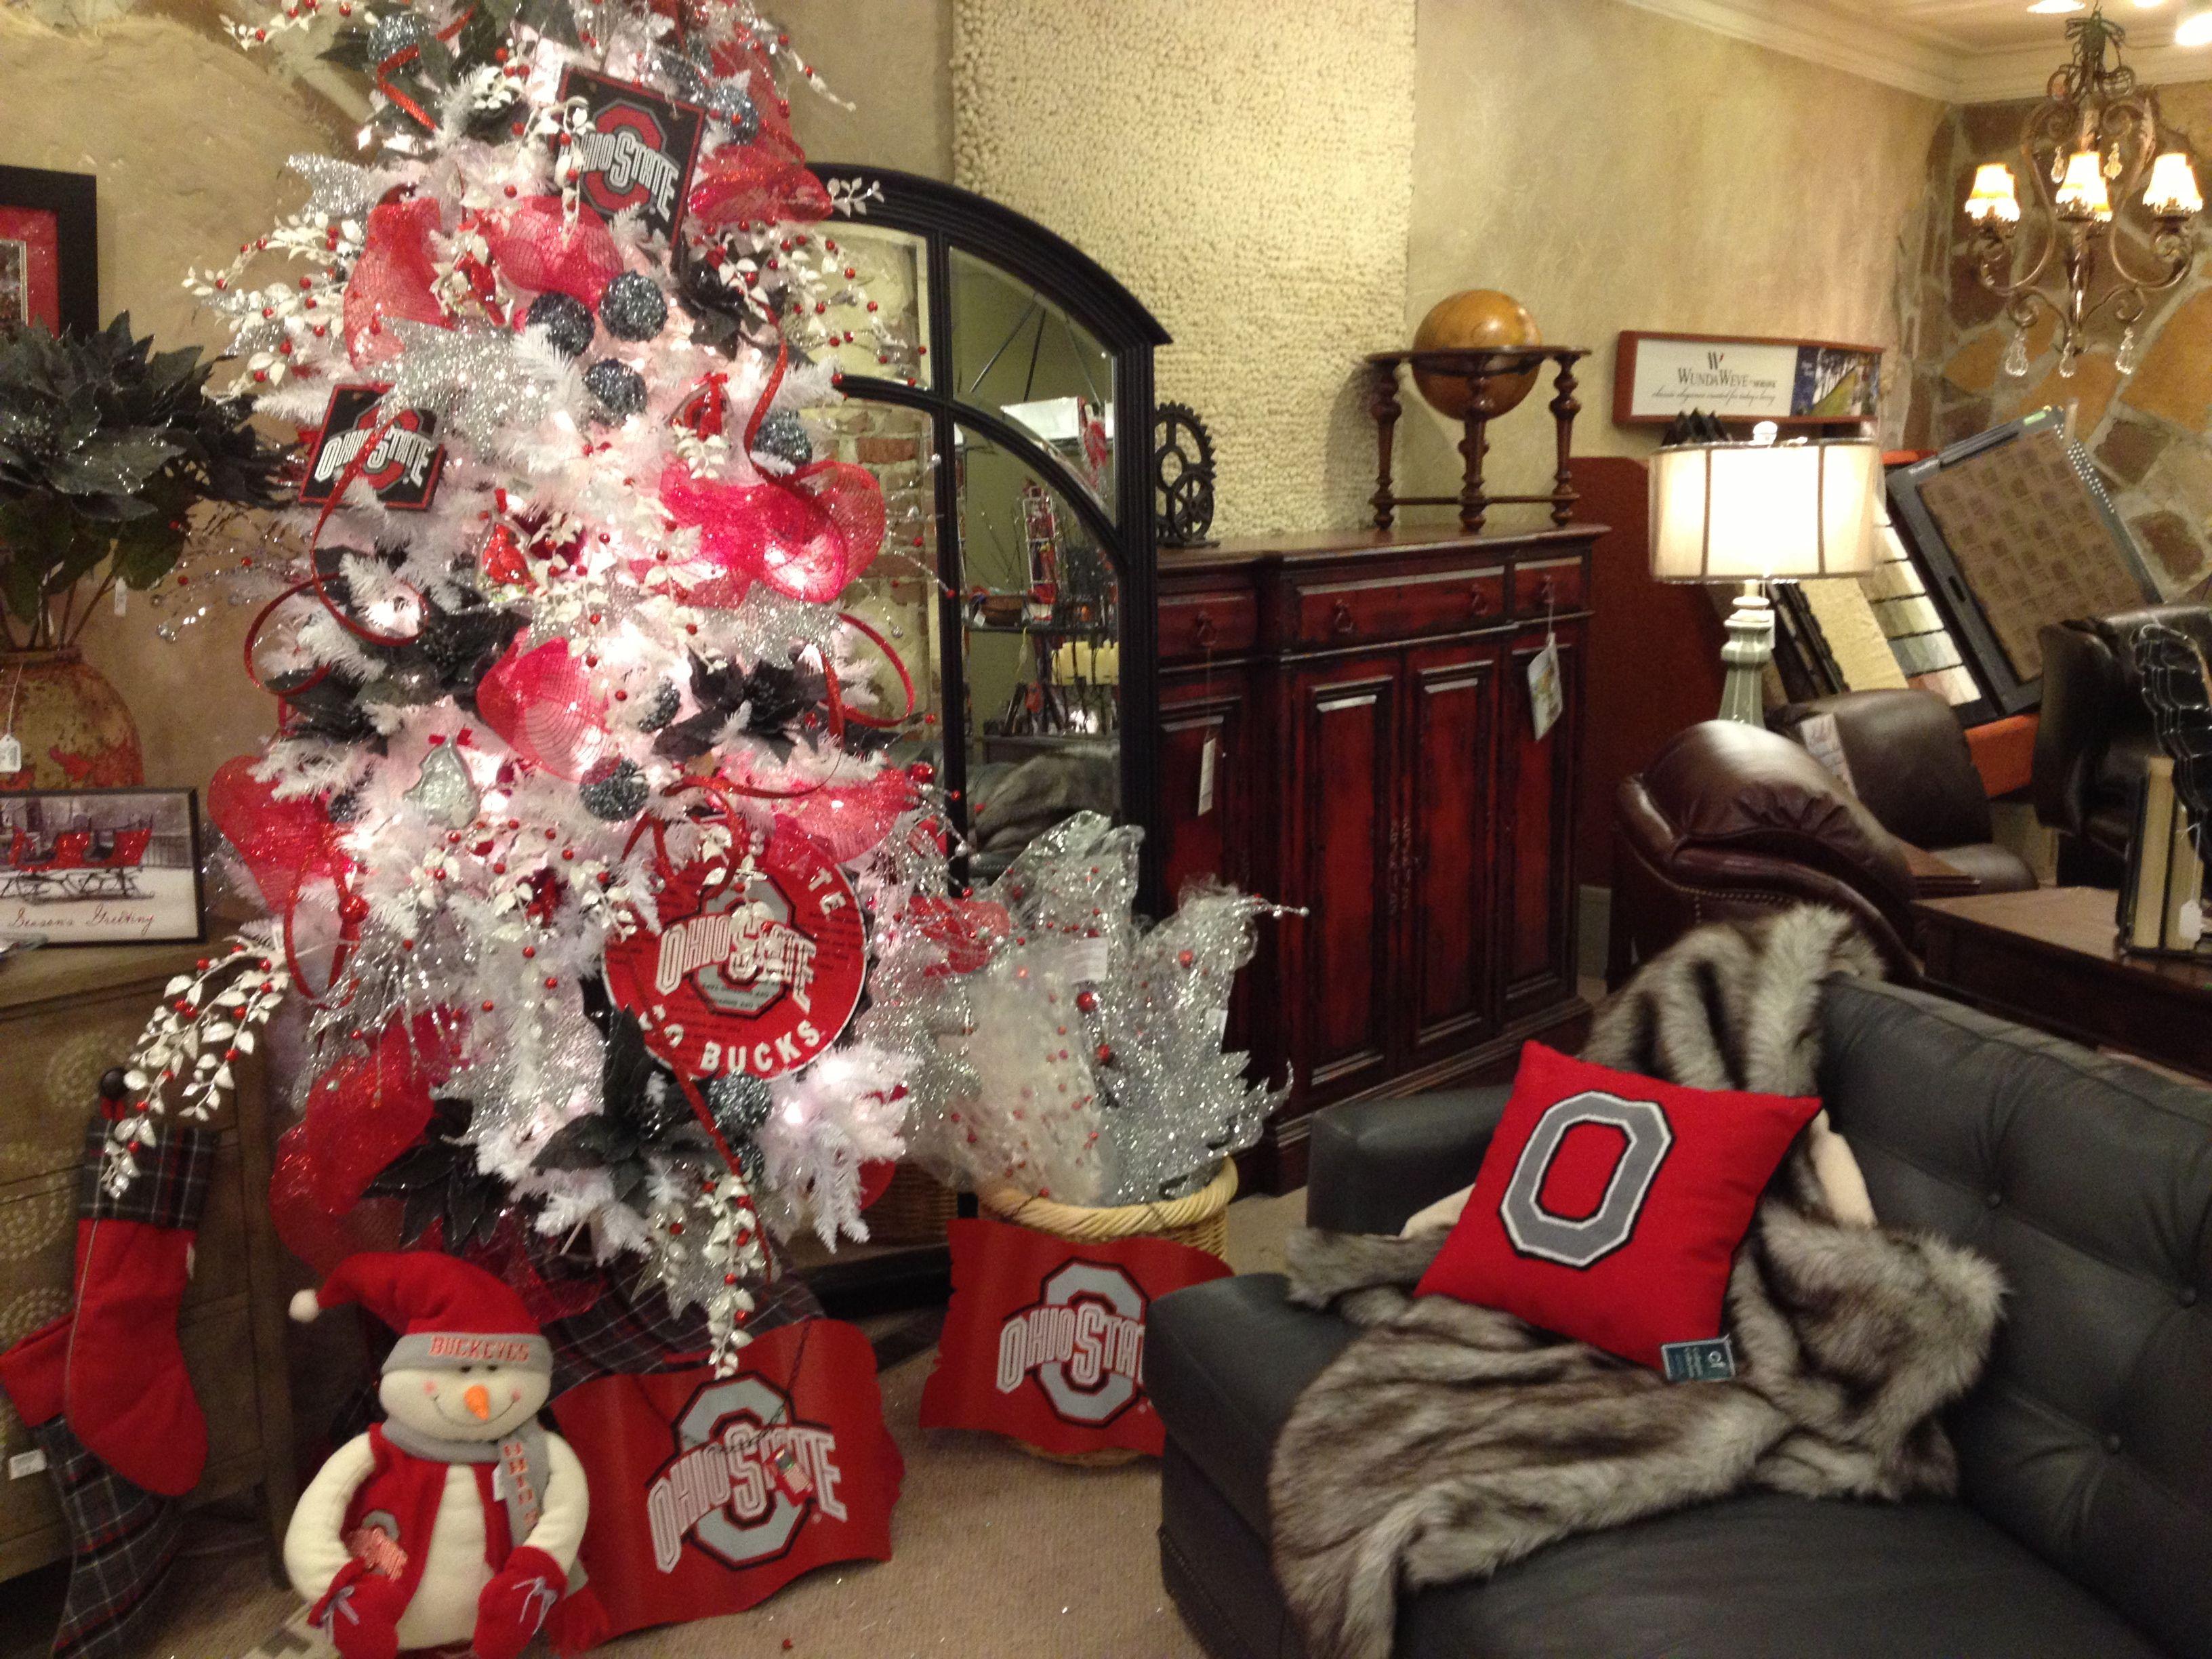 Ohio State Christmas tree and decor! | Fa La La | Pinterest | Ohio ...